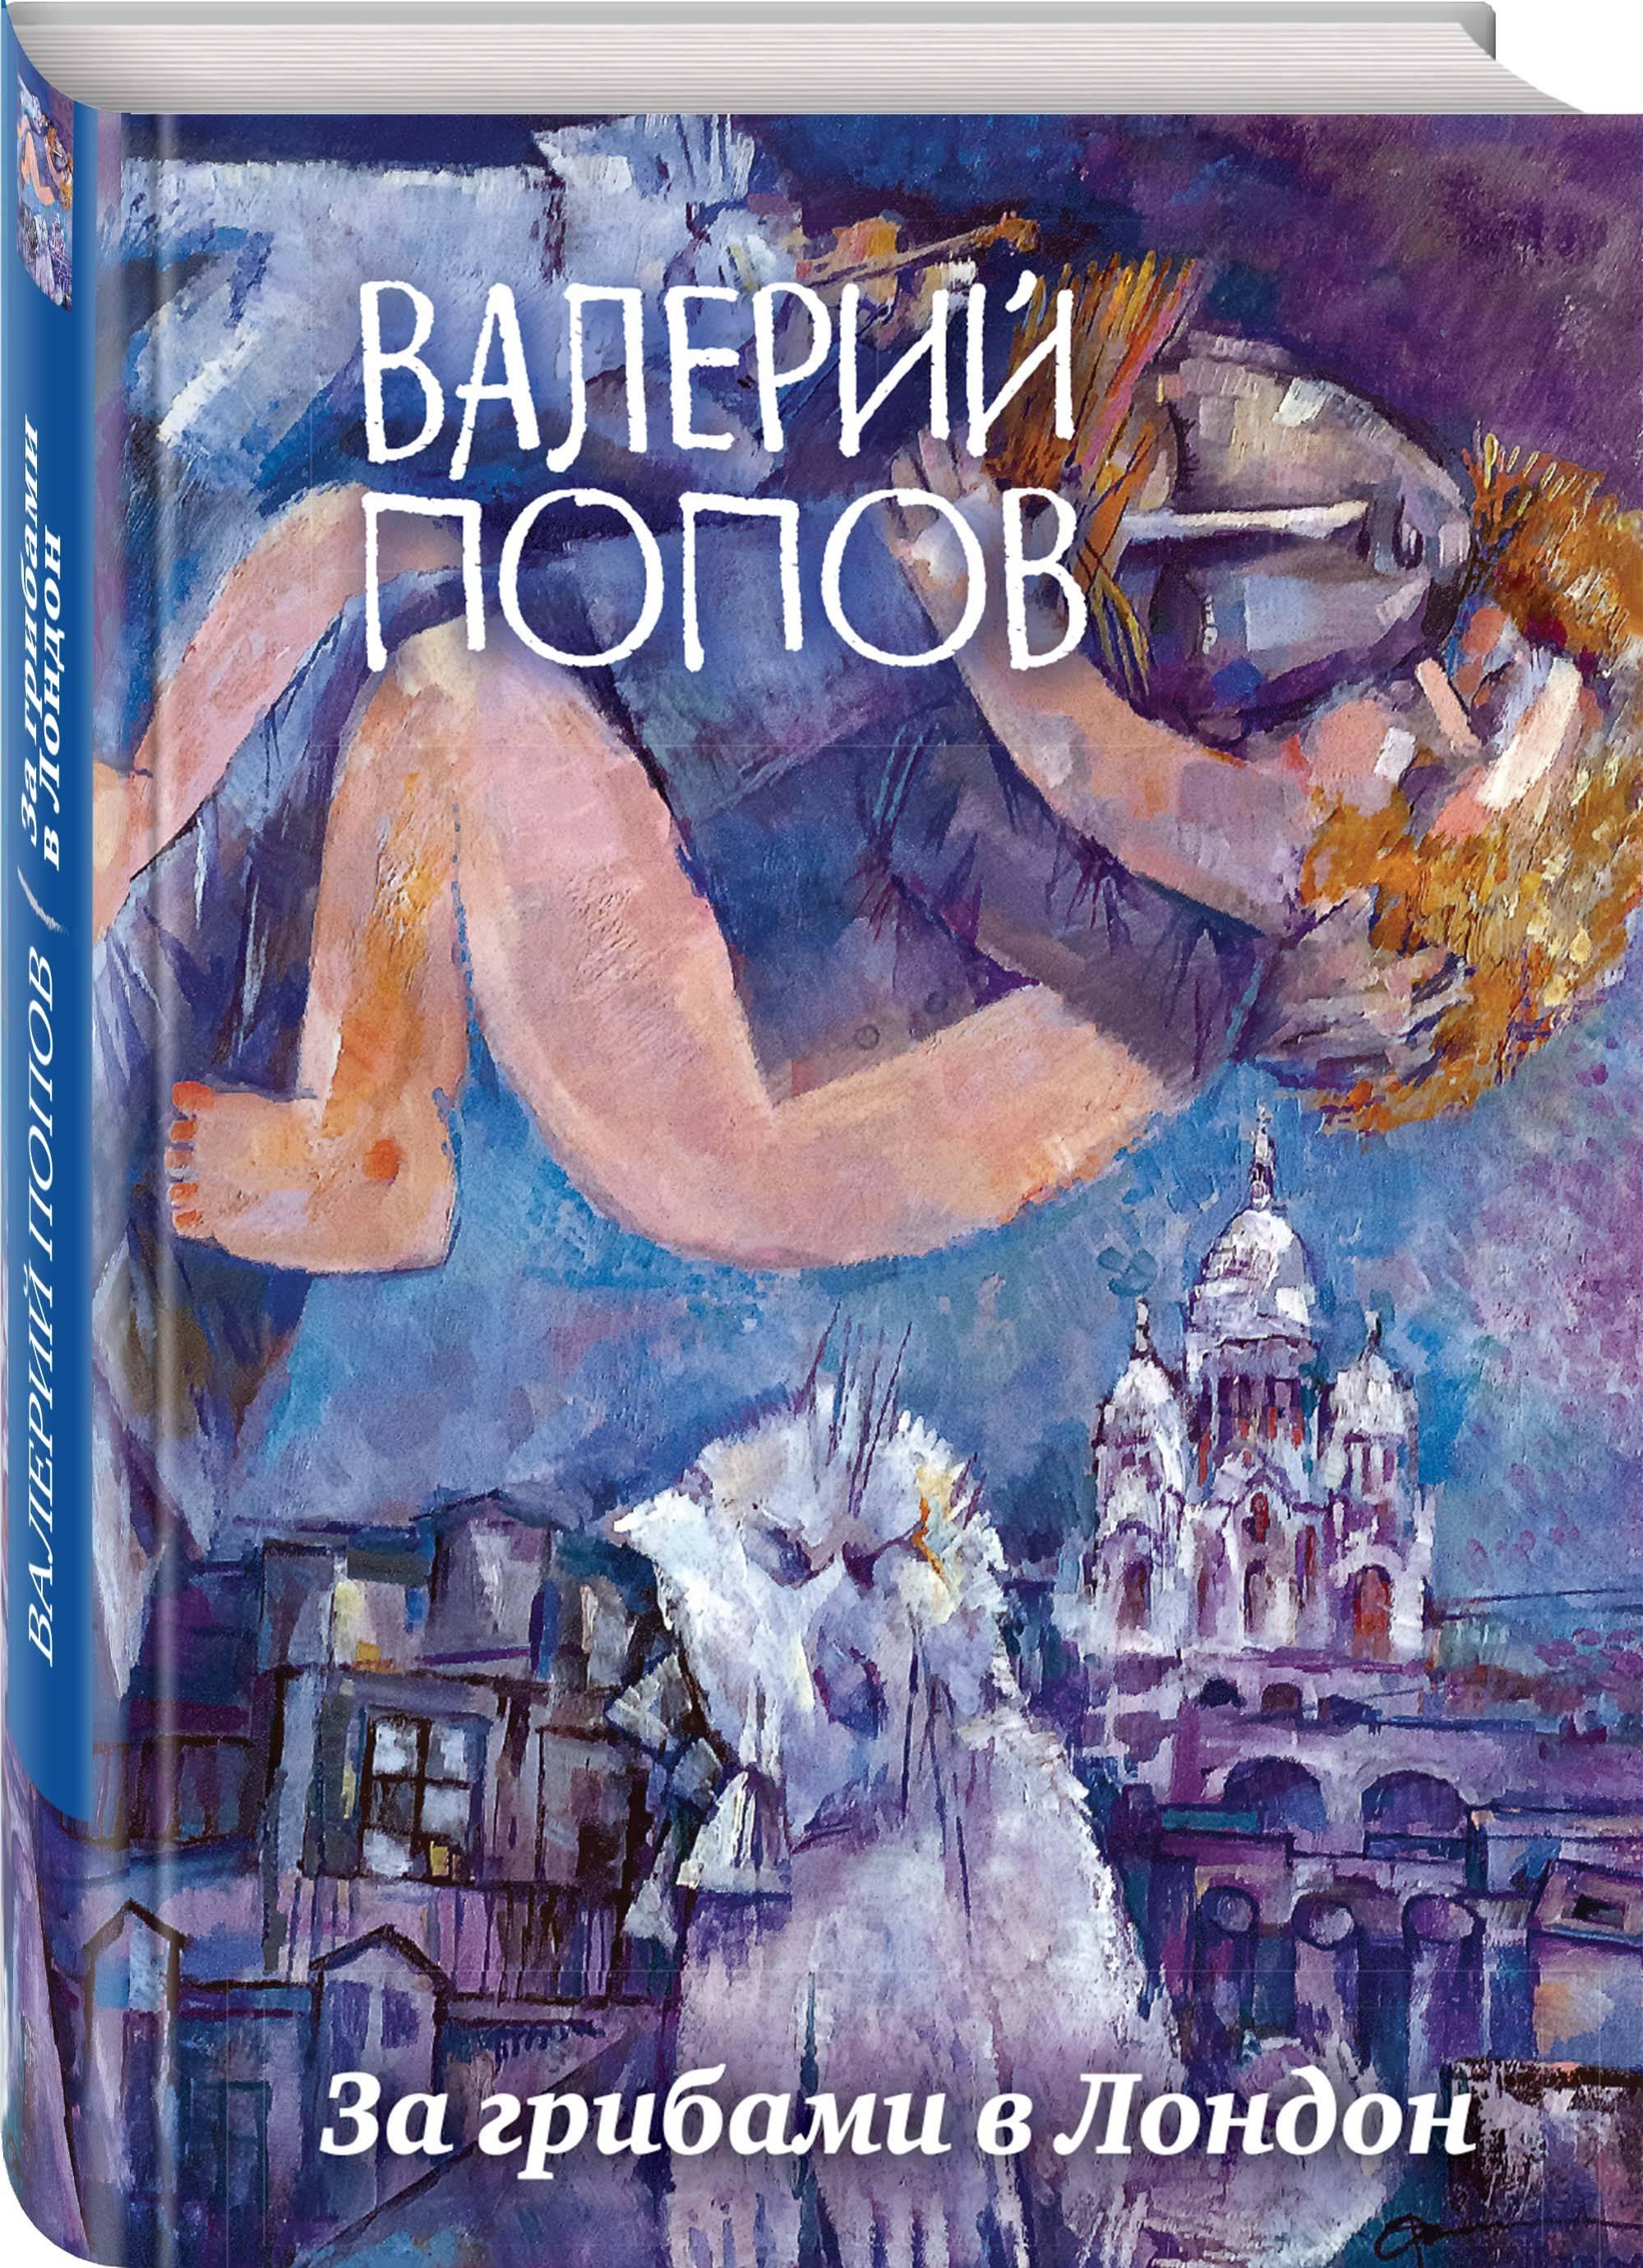 Попов В.Г. За грибами в Лондон ISBN: 978-5-04-090793-9 валерий попов за грибами в лондон